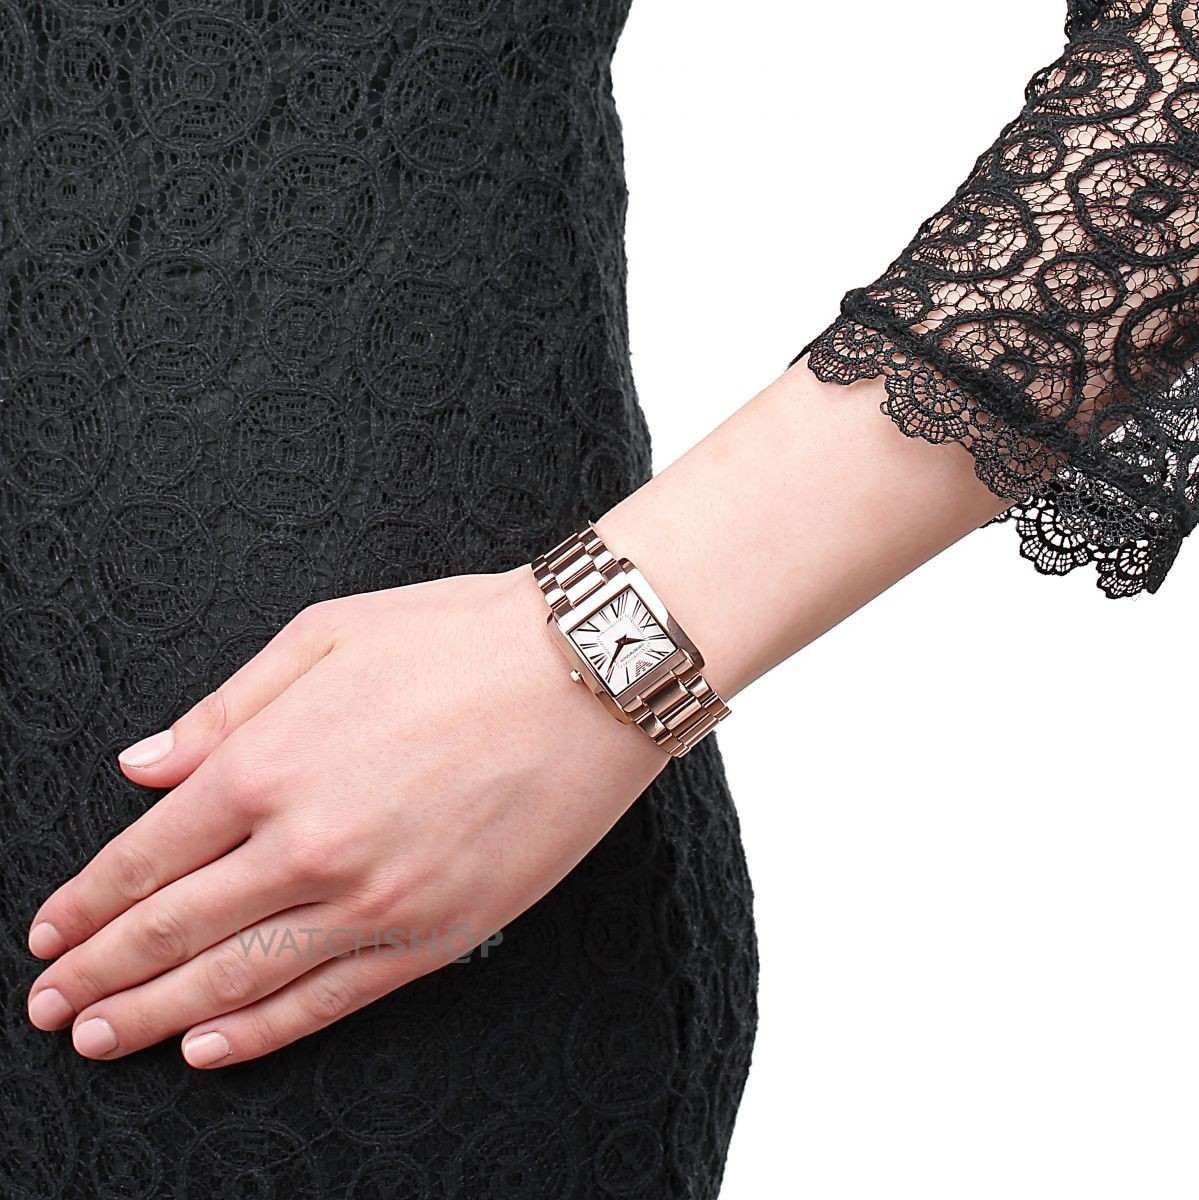 e235cda7d52 Relógio Emporio Armani Ladies Super Slim Ar2051 - R  1.699